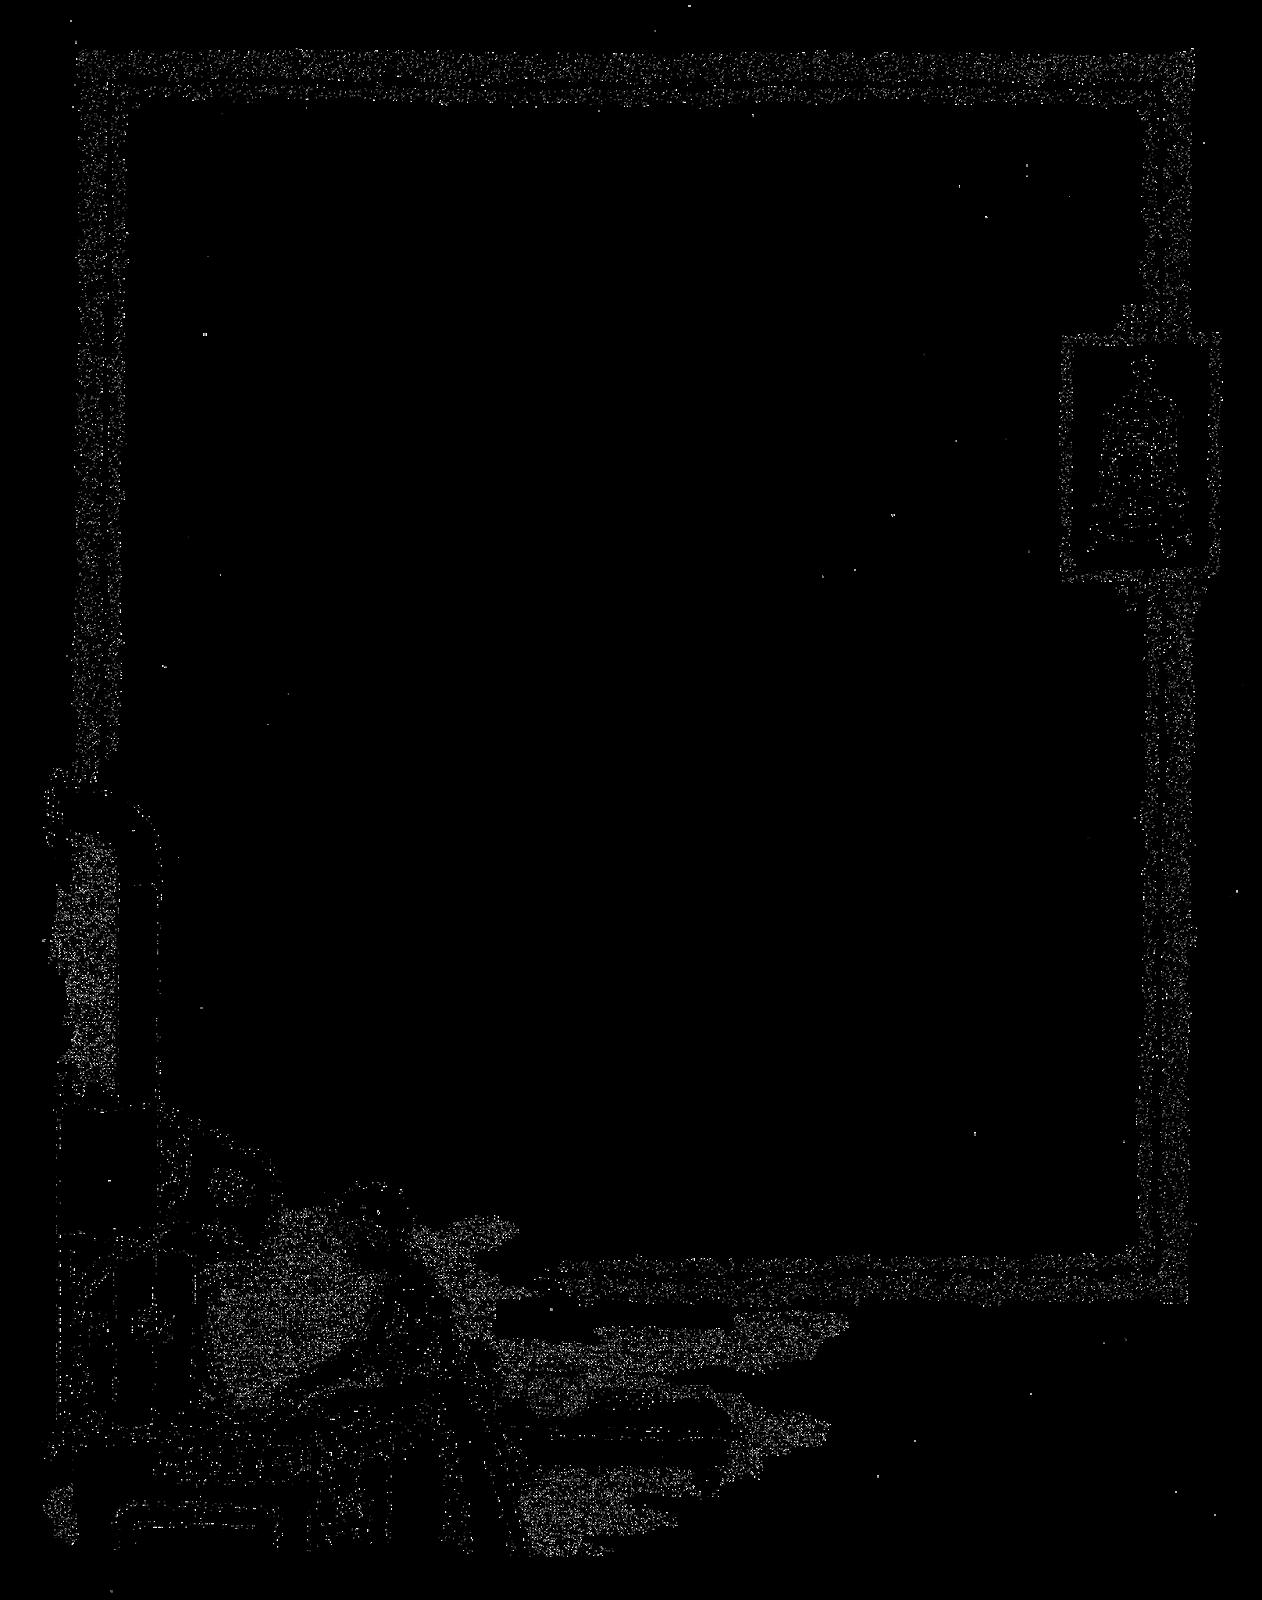 Frames clipart kitchen. Digital stamp design free